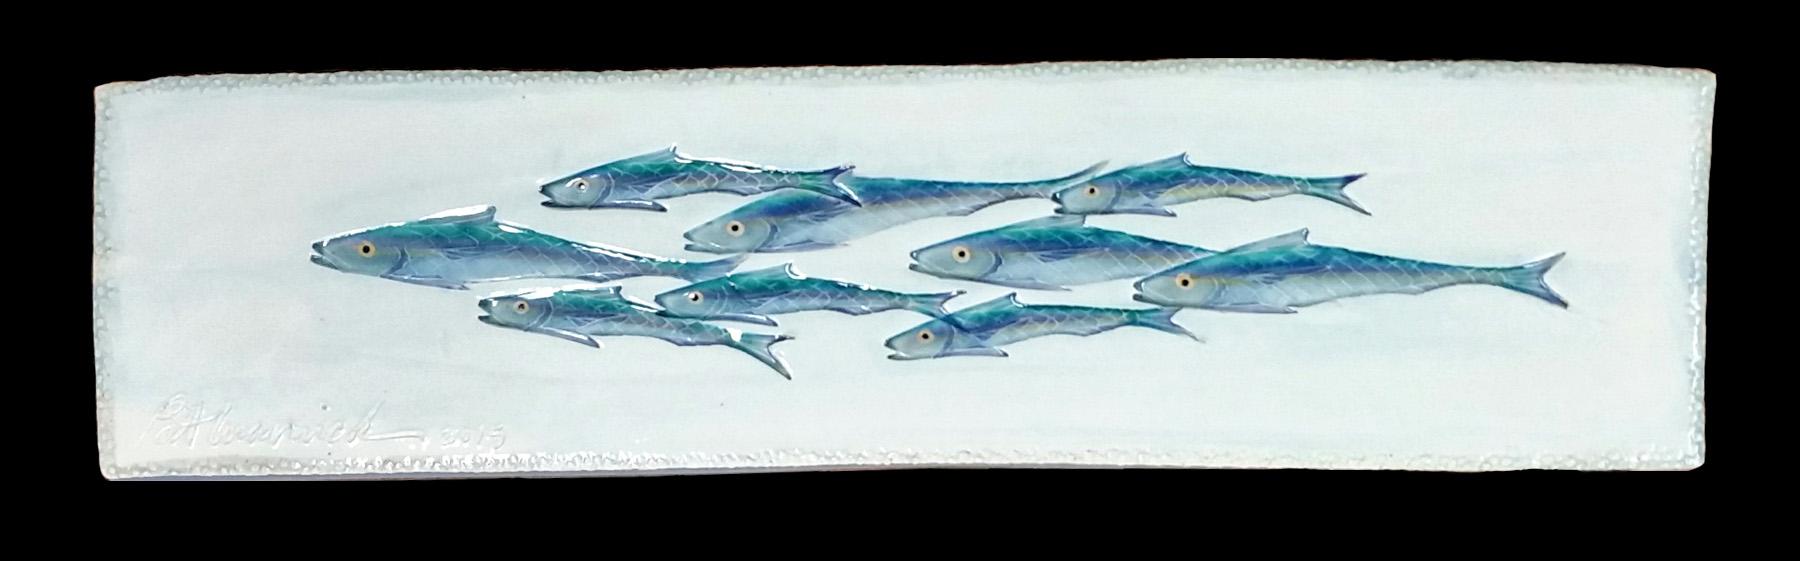 small fish school